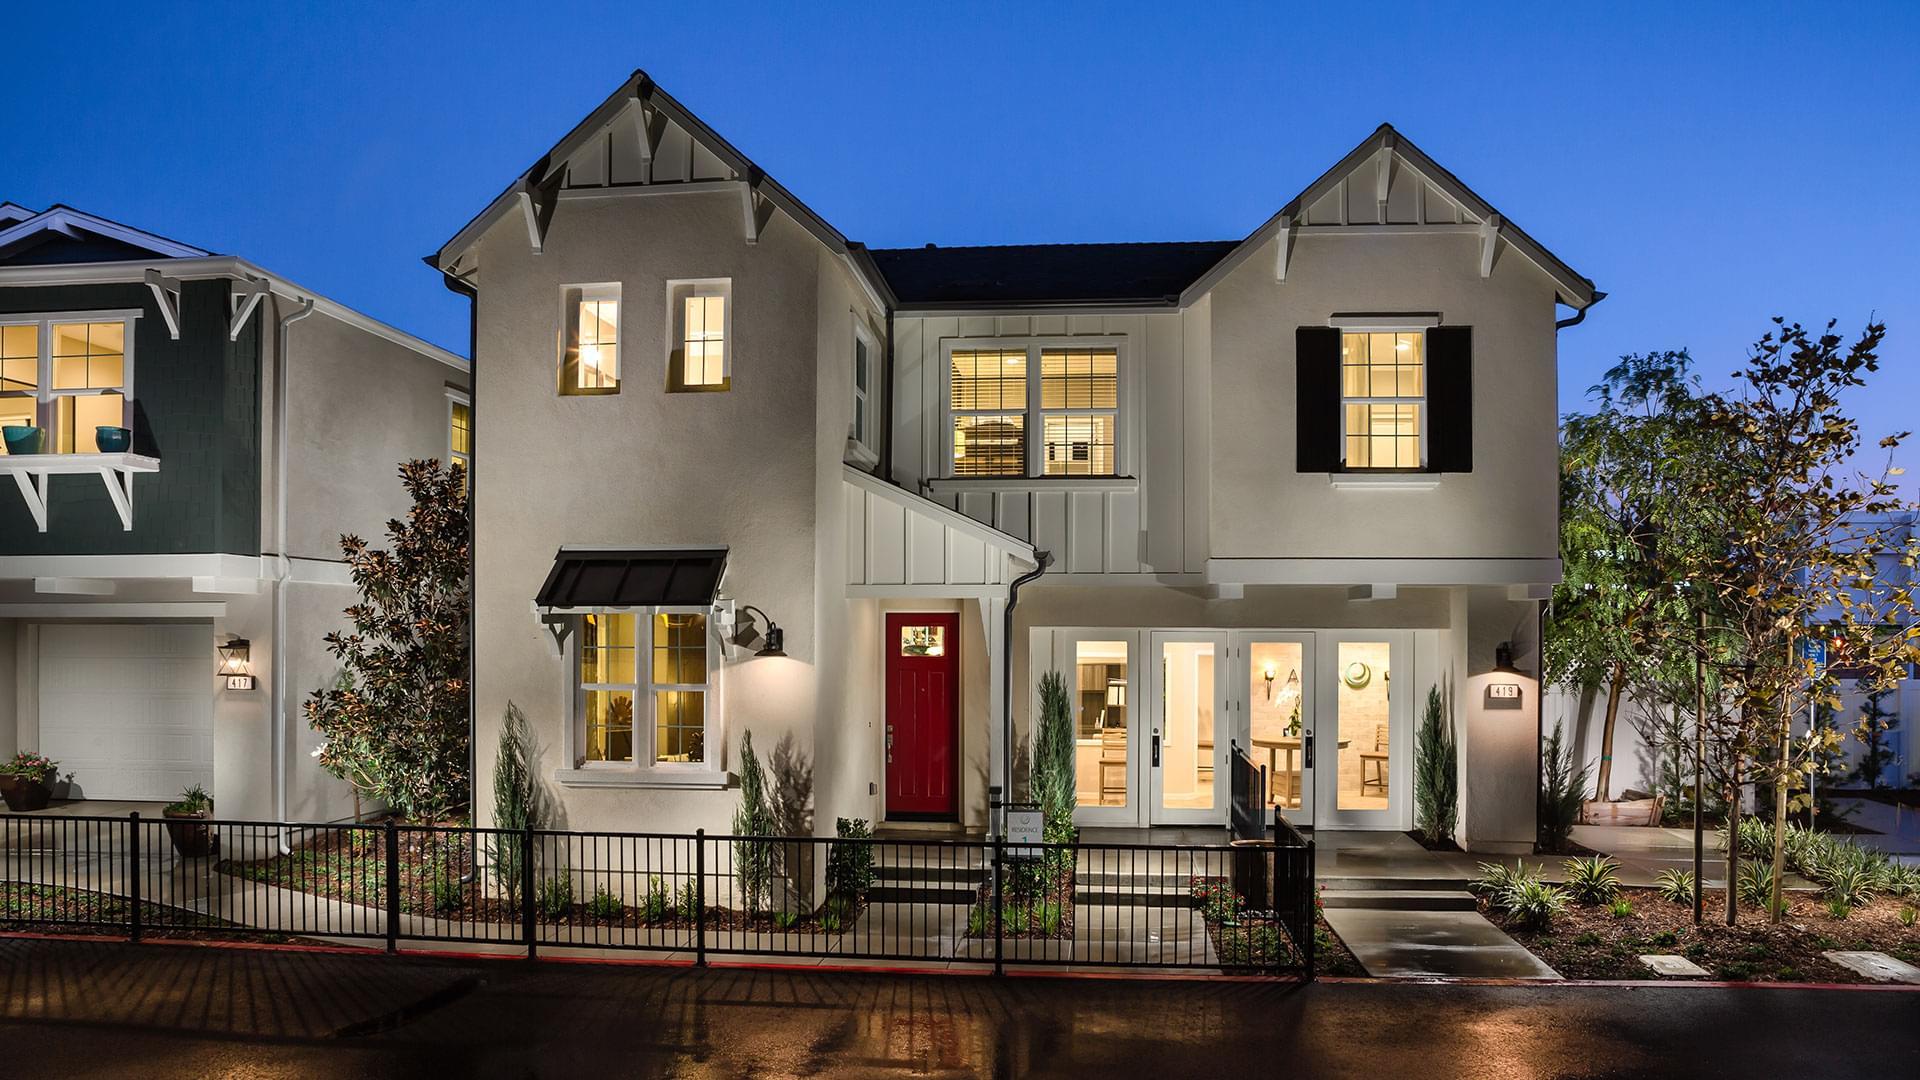 419 Aura Drive in Costa Mesa , CA by DeNova Homes